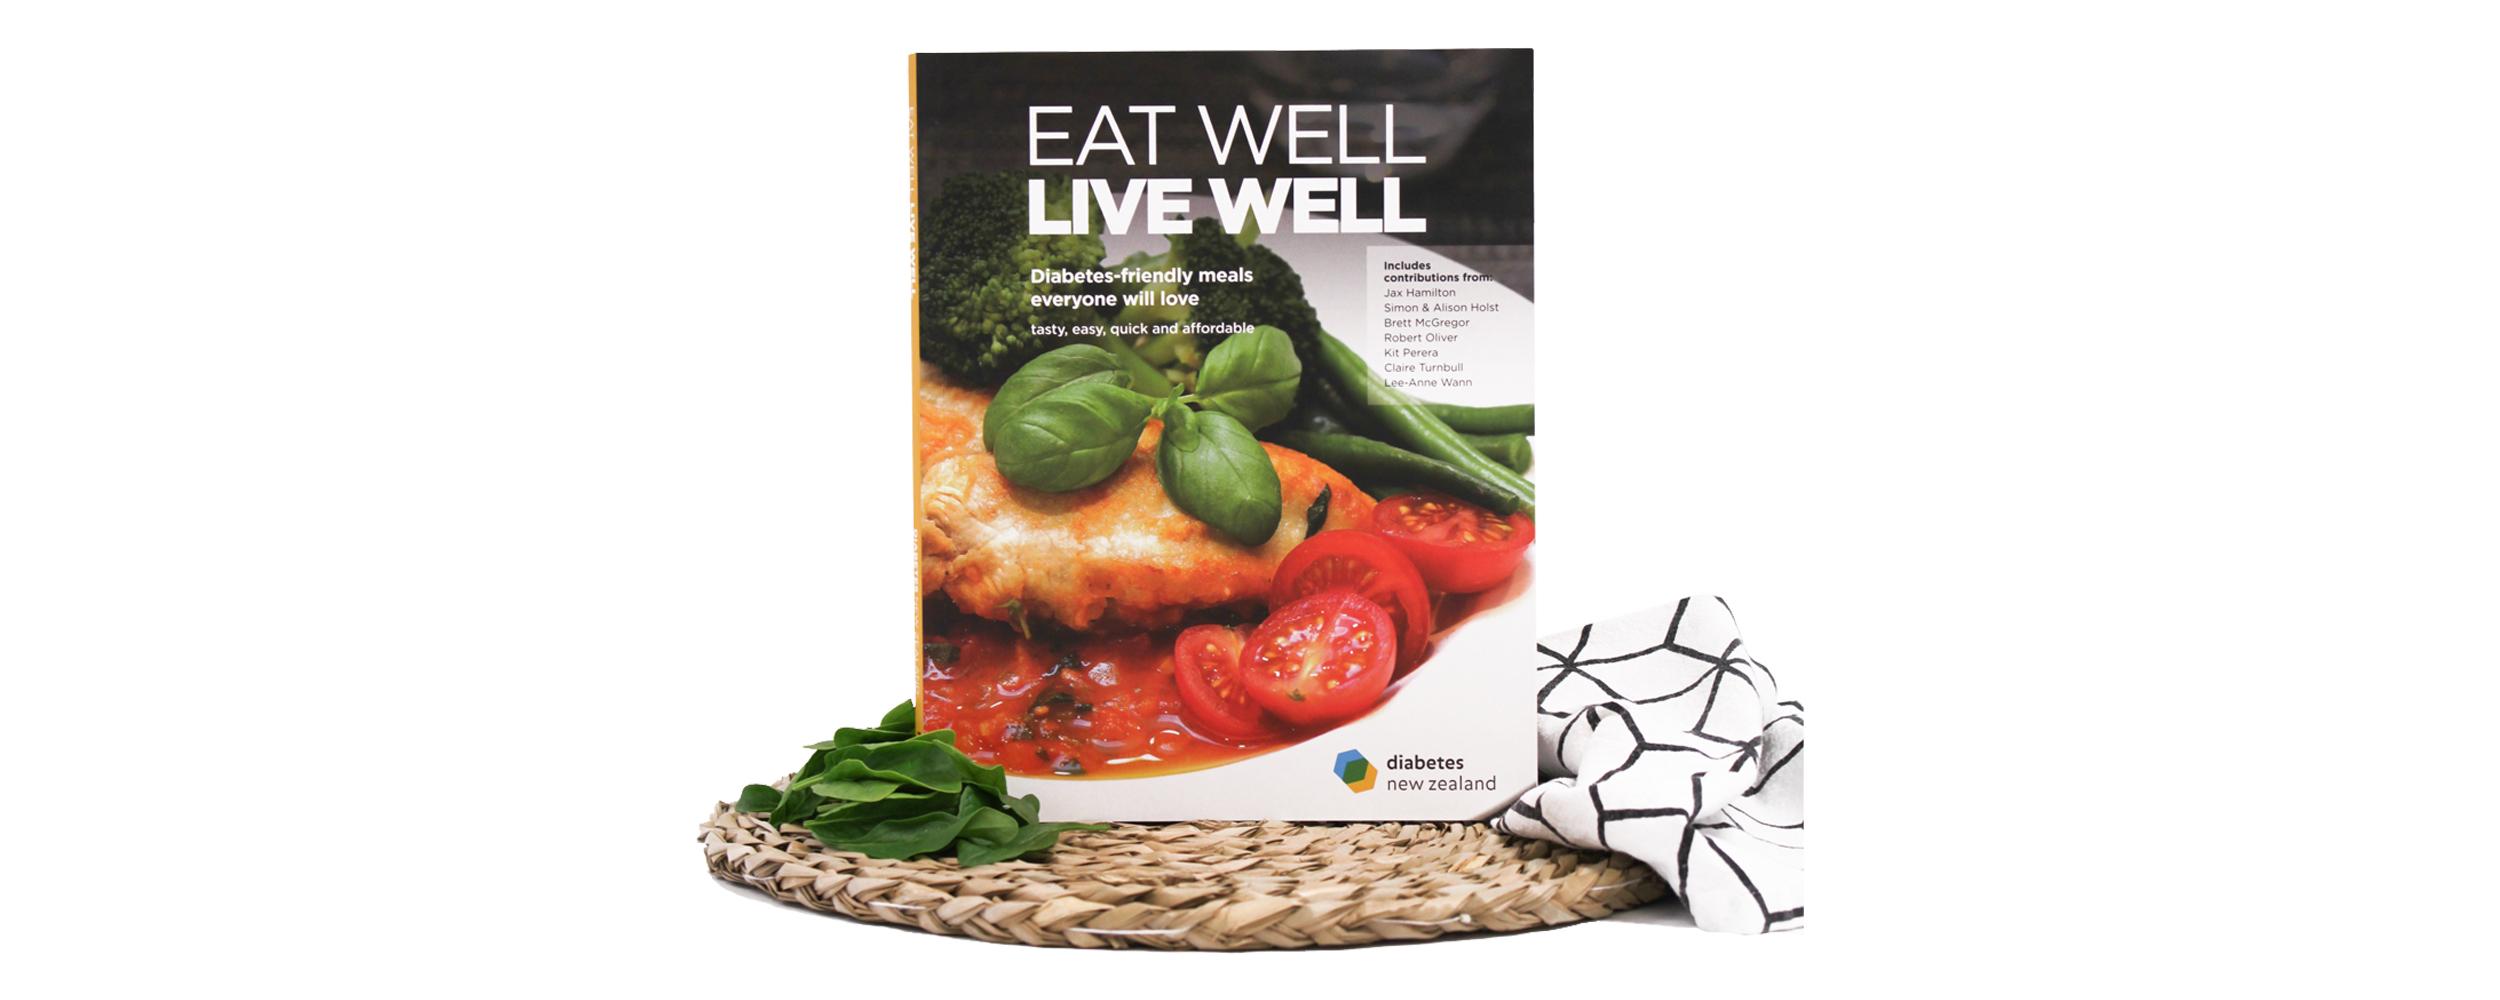 eat-well-live-well-banner copy.jpg